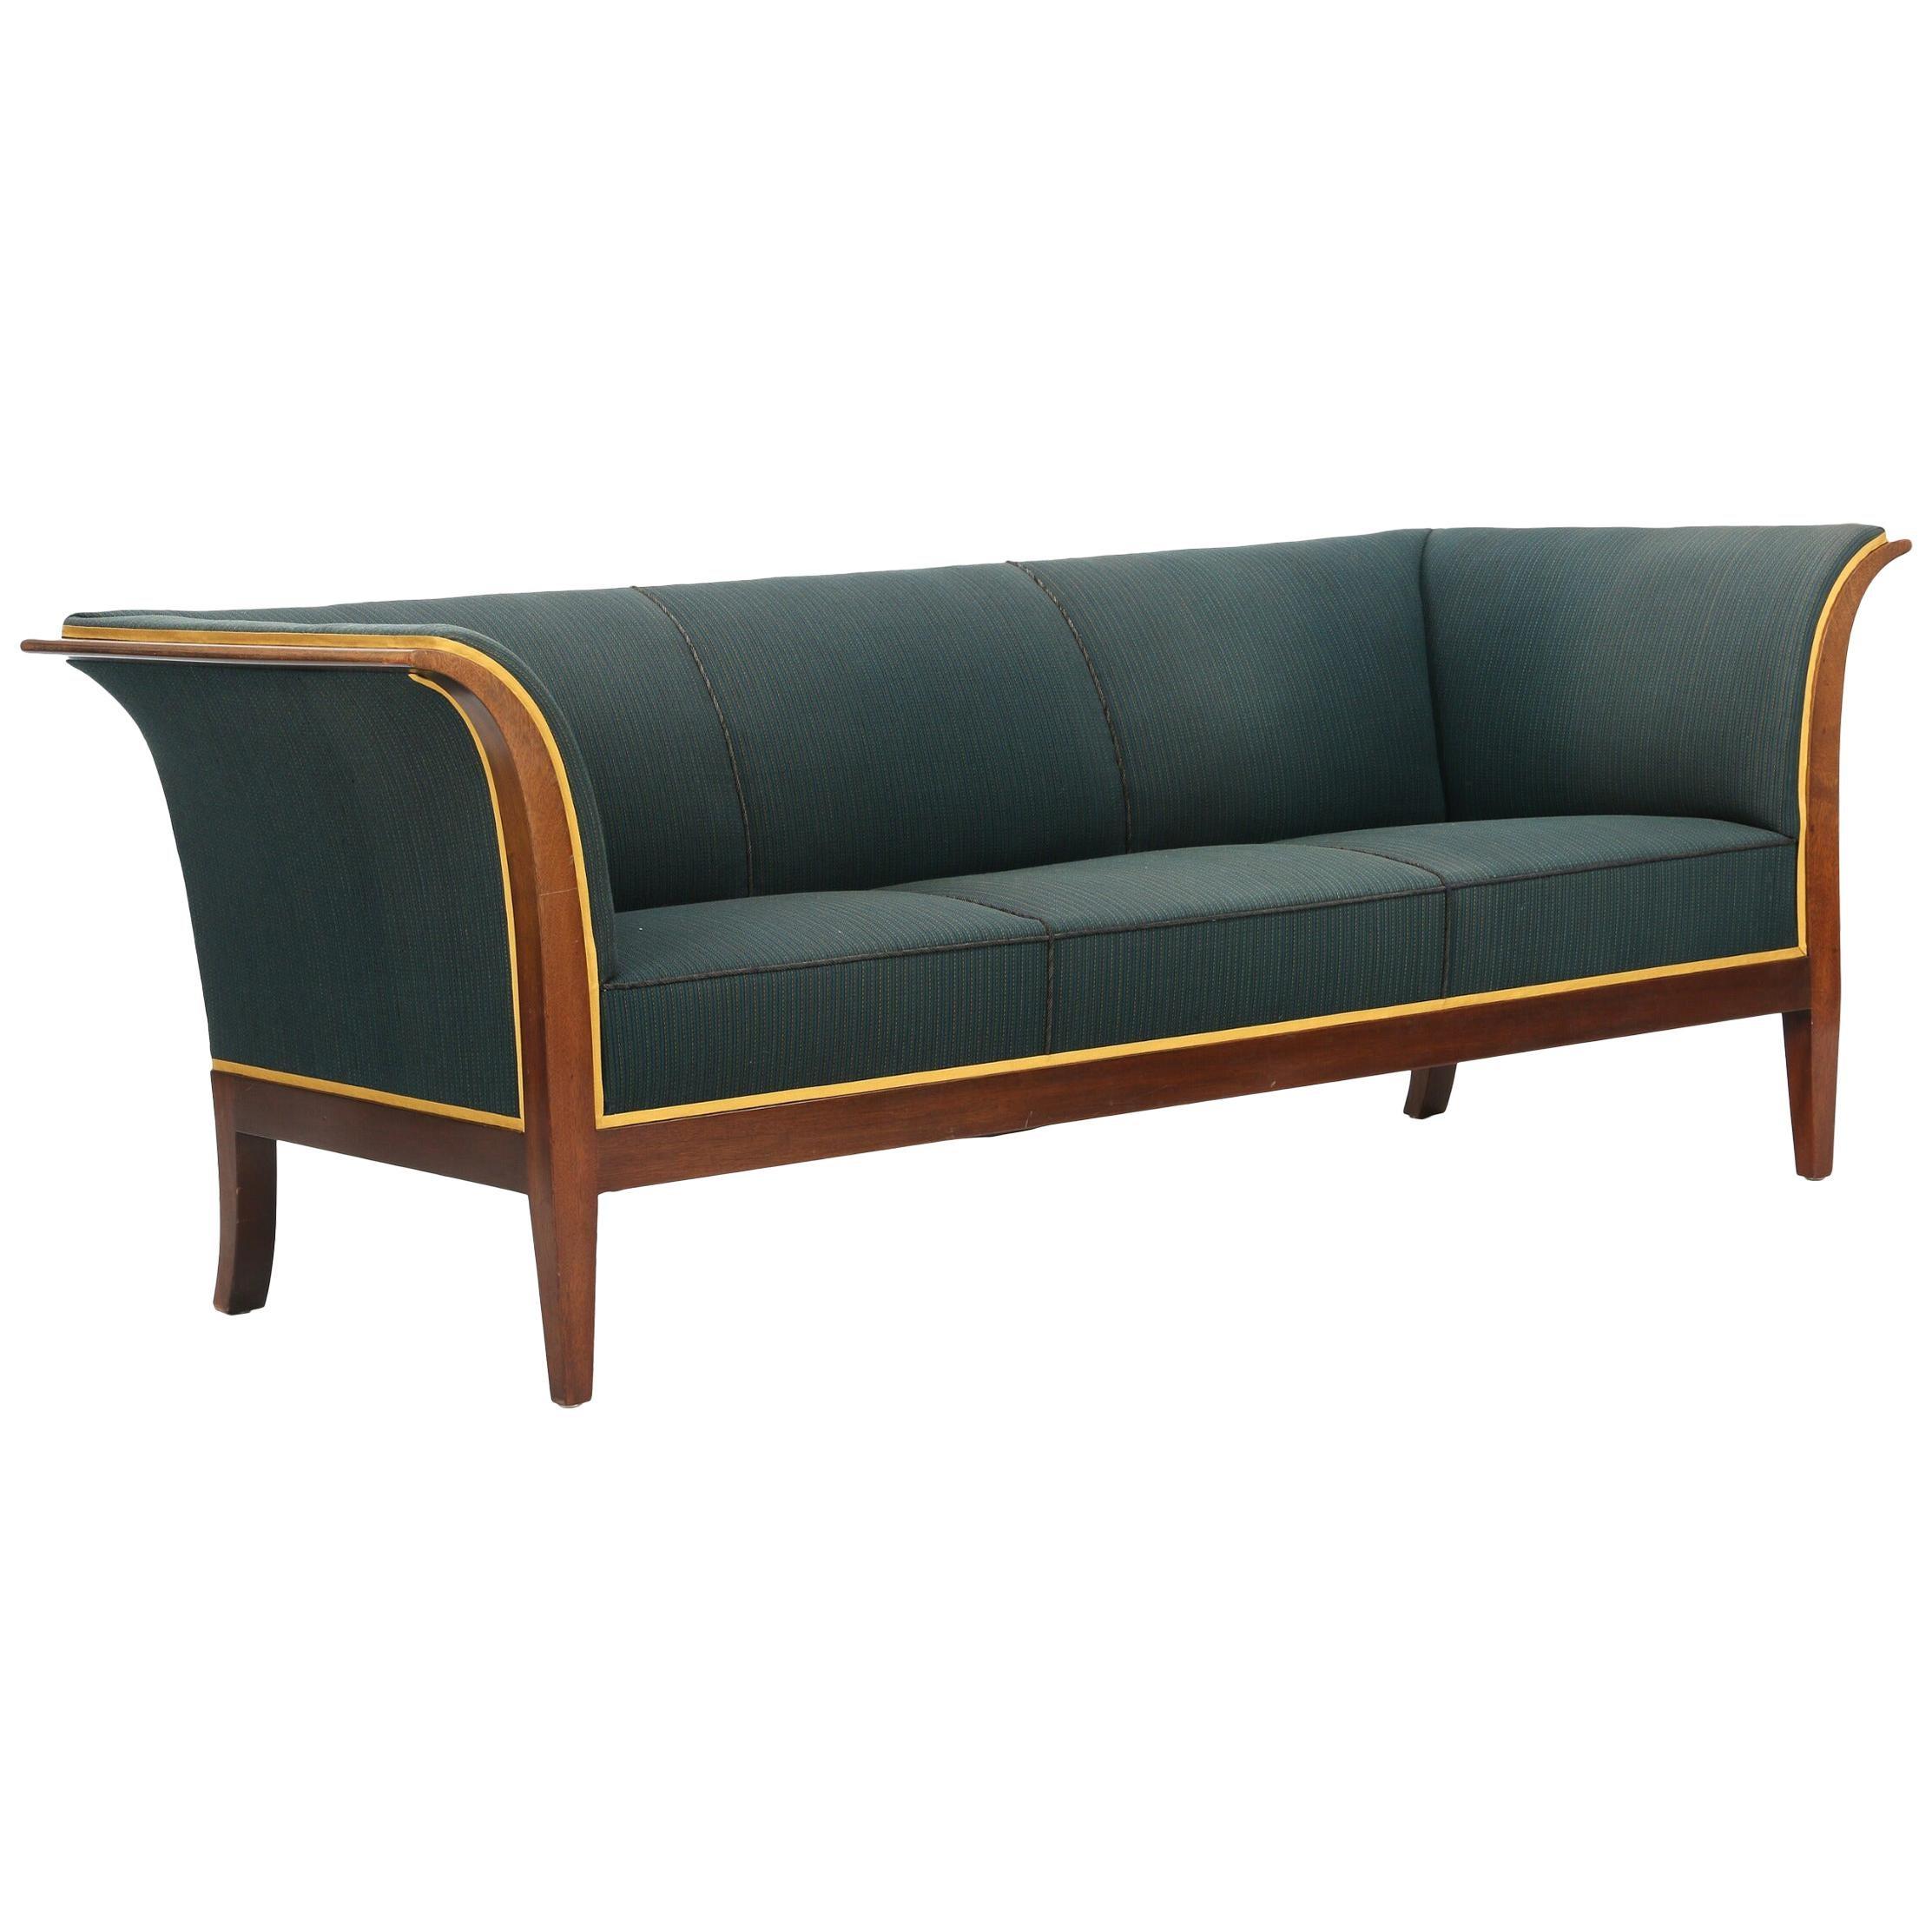 Three-Seat Sofa with Mahogany Frame by Frits Henningsen